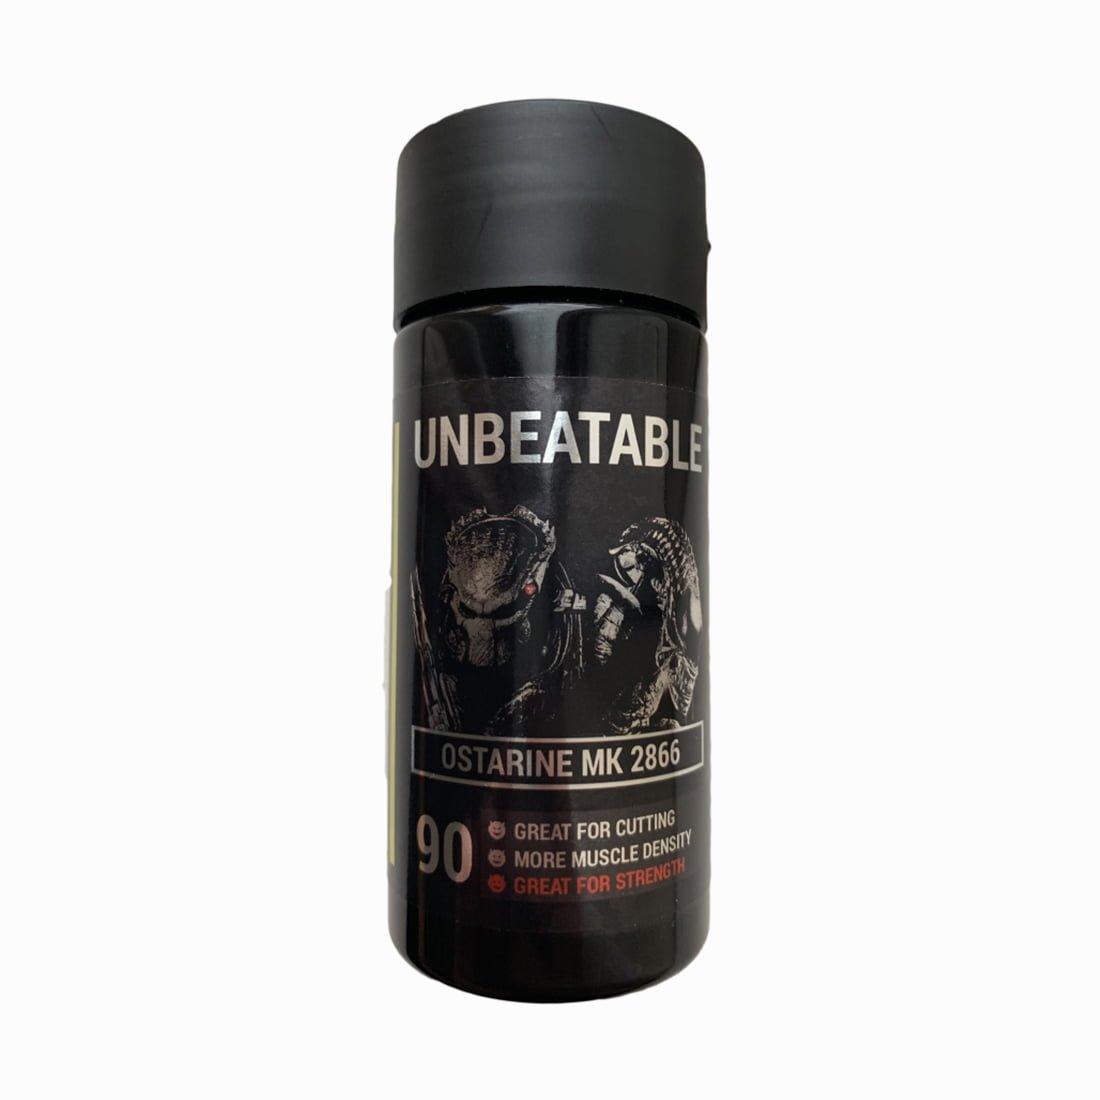 UNBEATABLE Ostarine (MK2866) 90caps